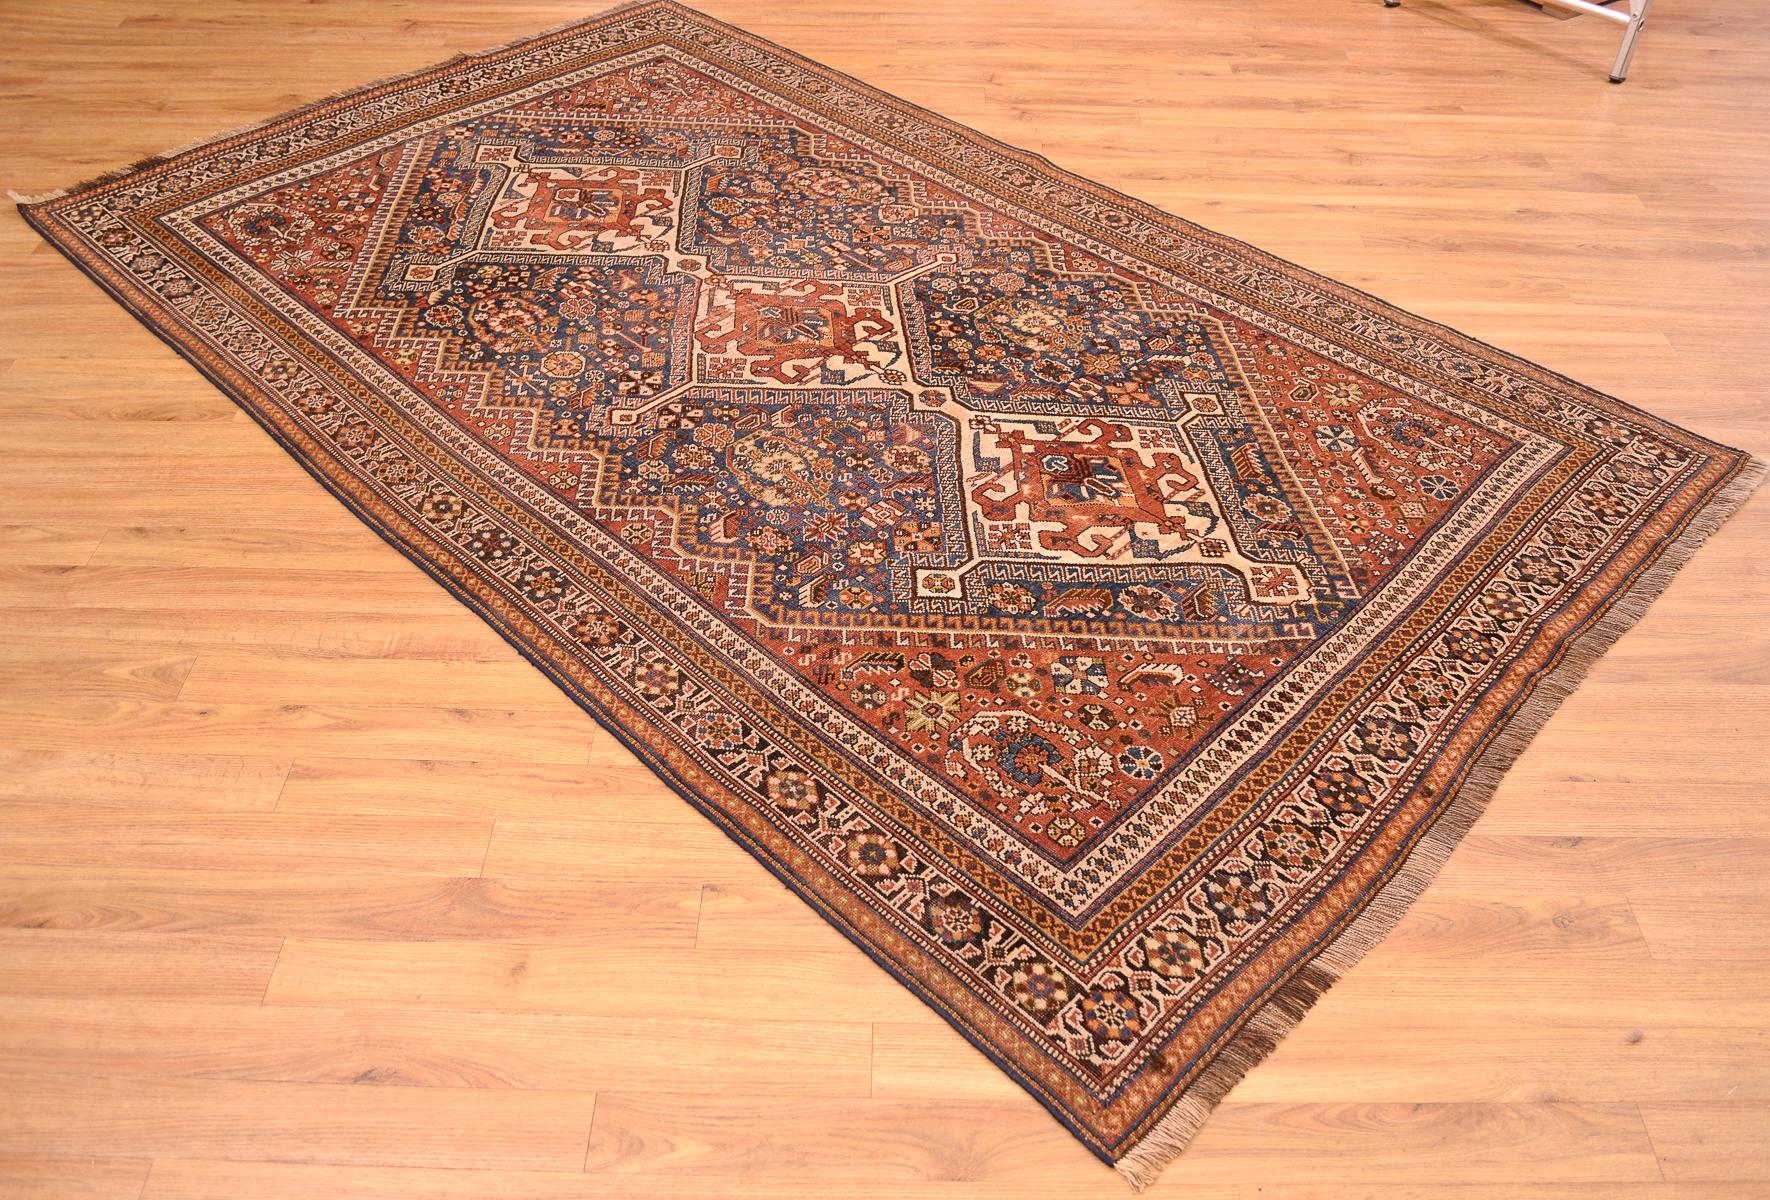 Antique Persian Qashqai Rug 2 32x1 41m The Oriental Rug